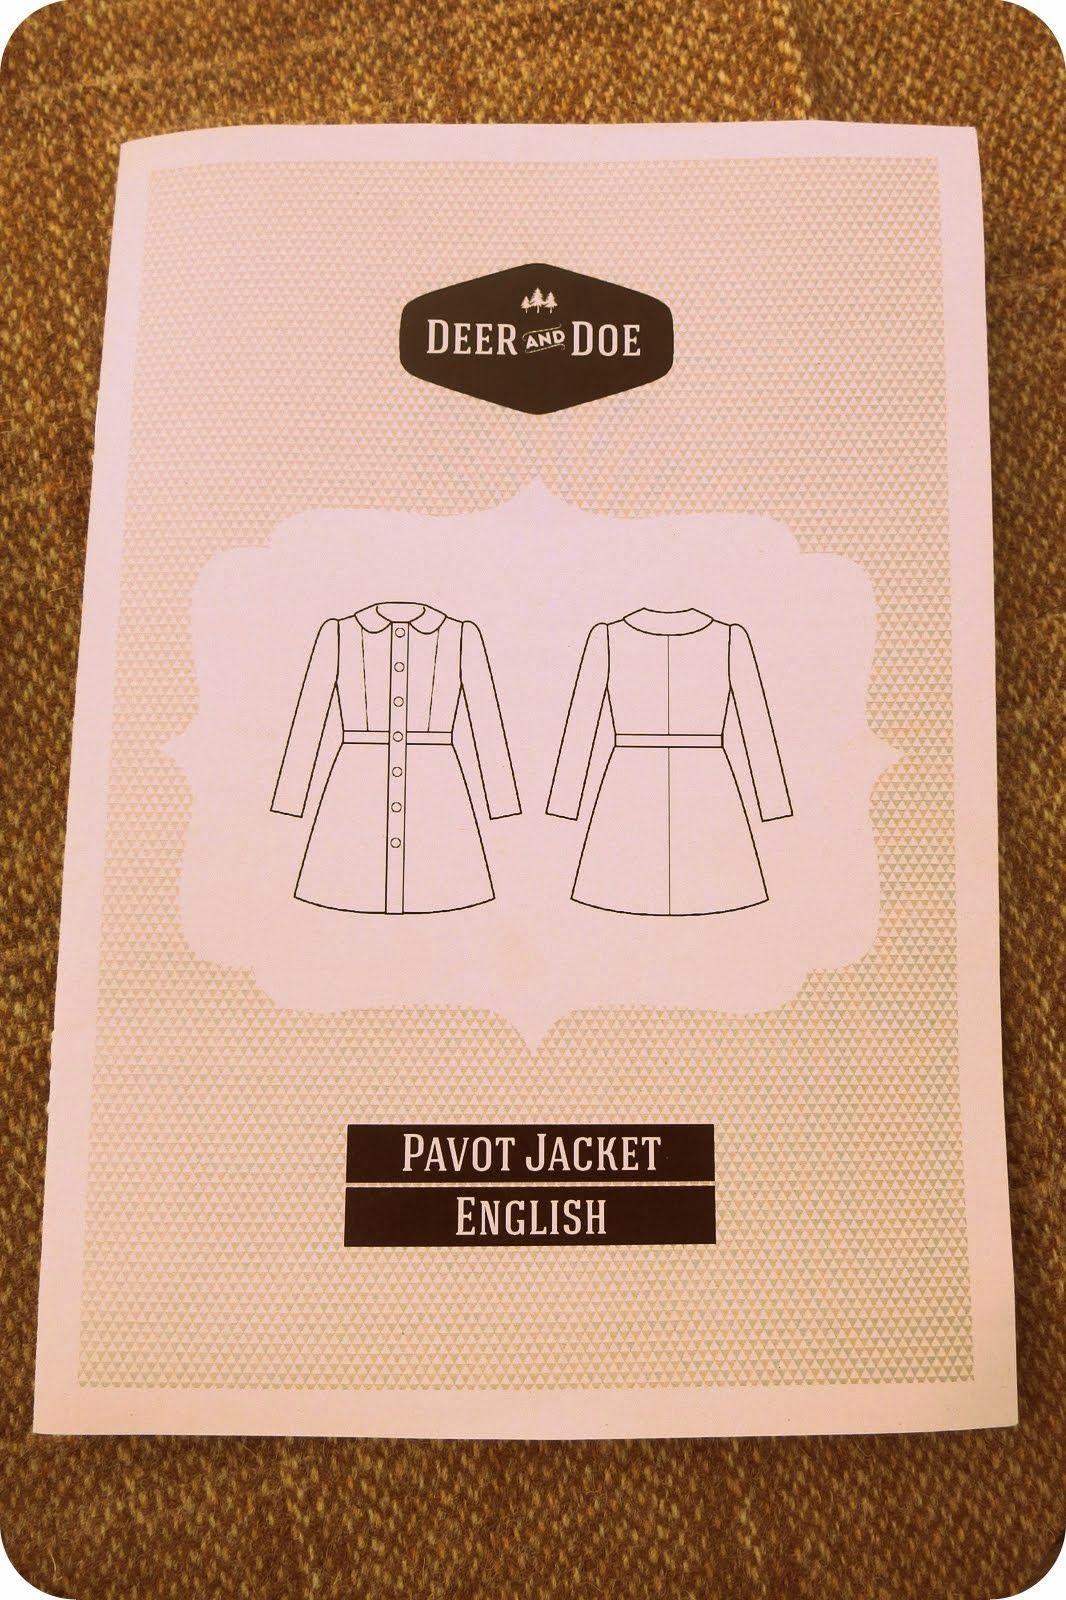 frau knopf: Herbst-Jacken-Sew-Along 2014: Inspiration und Schnittsammlung